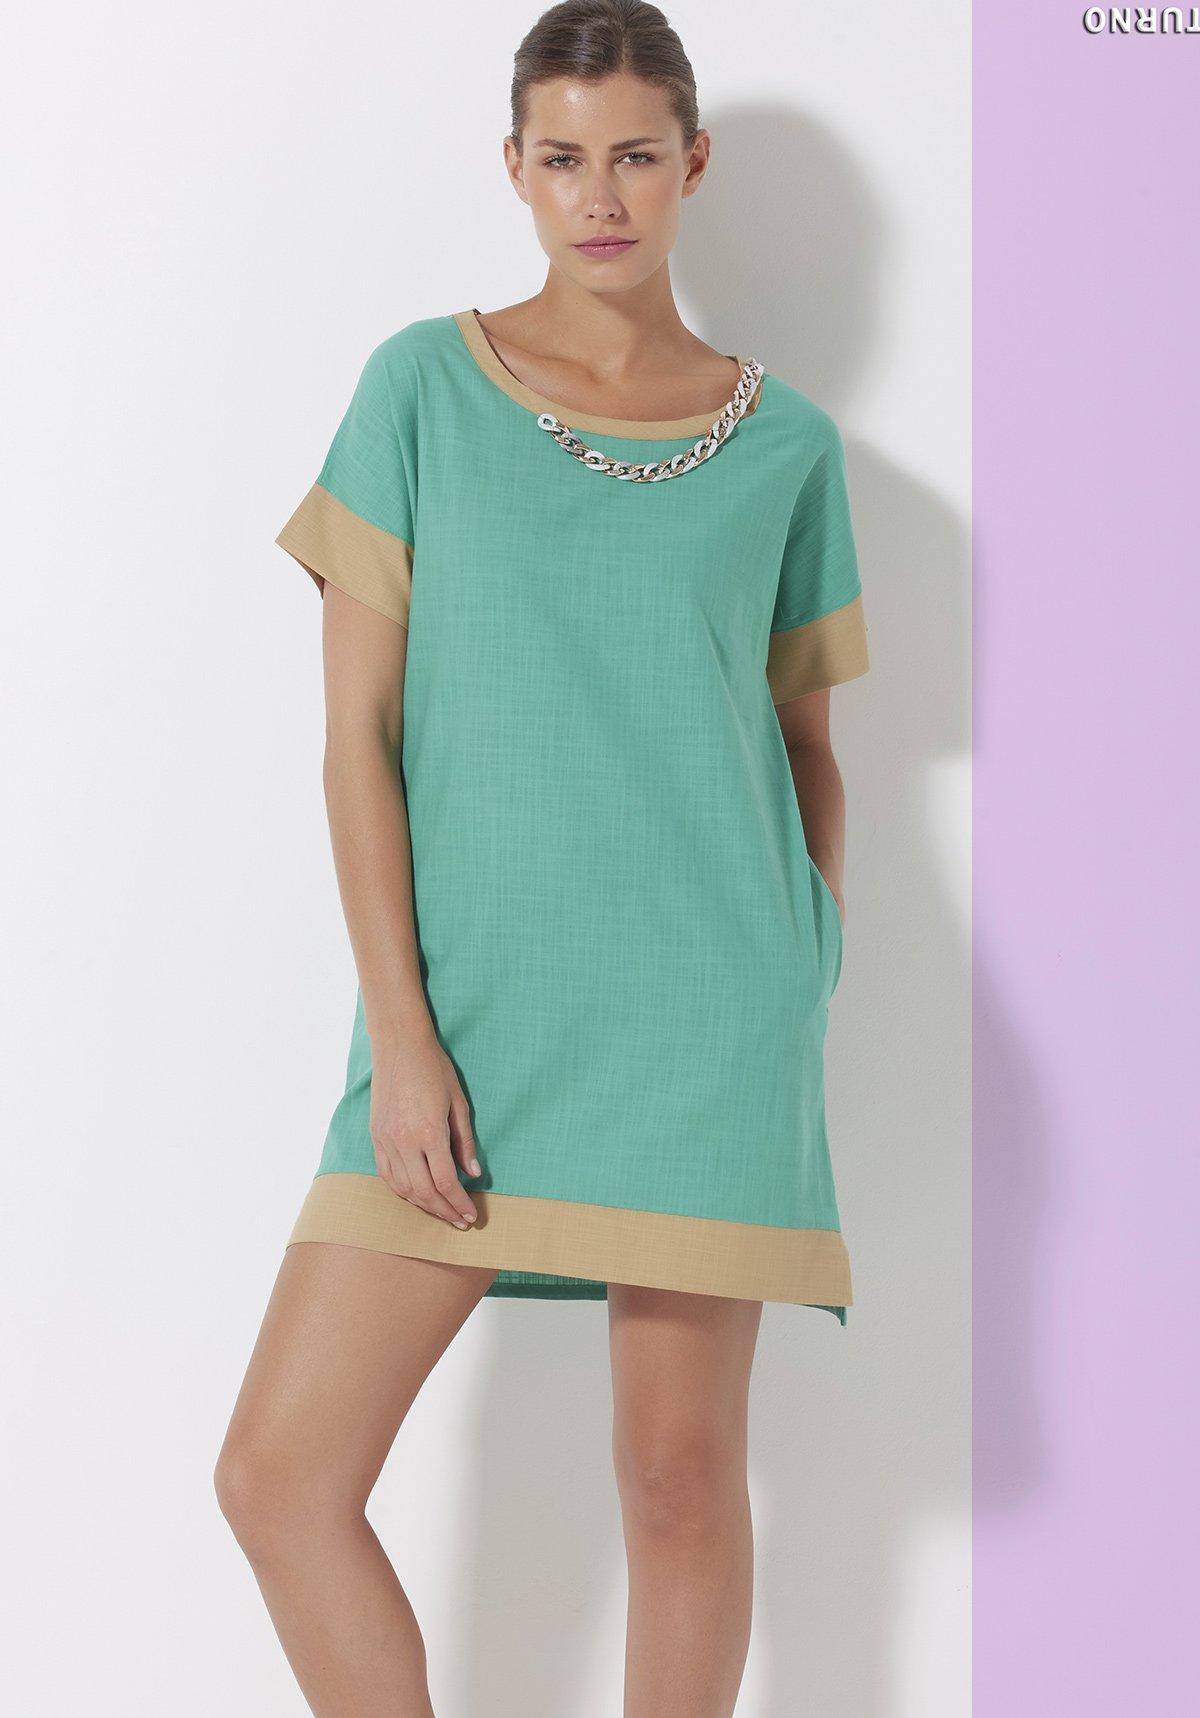 Платье Shine Цвет: Зеленый (42) Sunnyday sunn508280